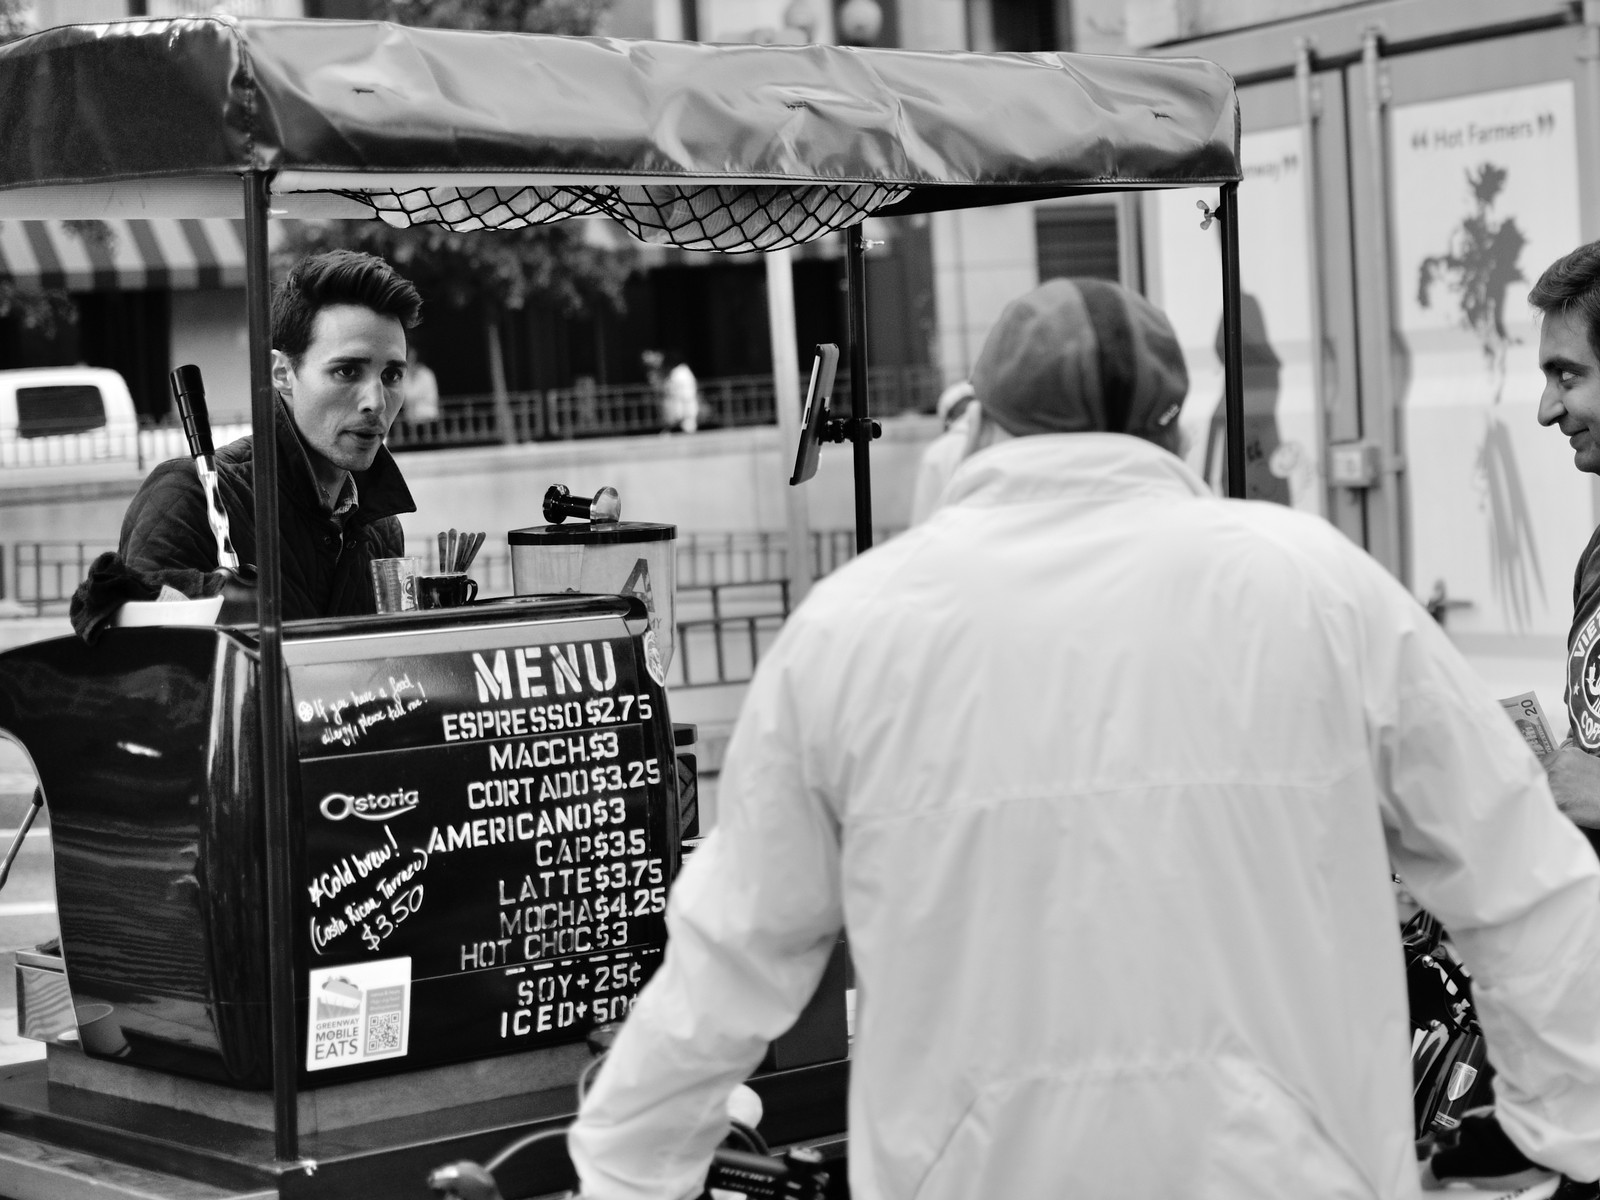 two men order espresso at a stand in boston